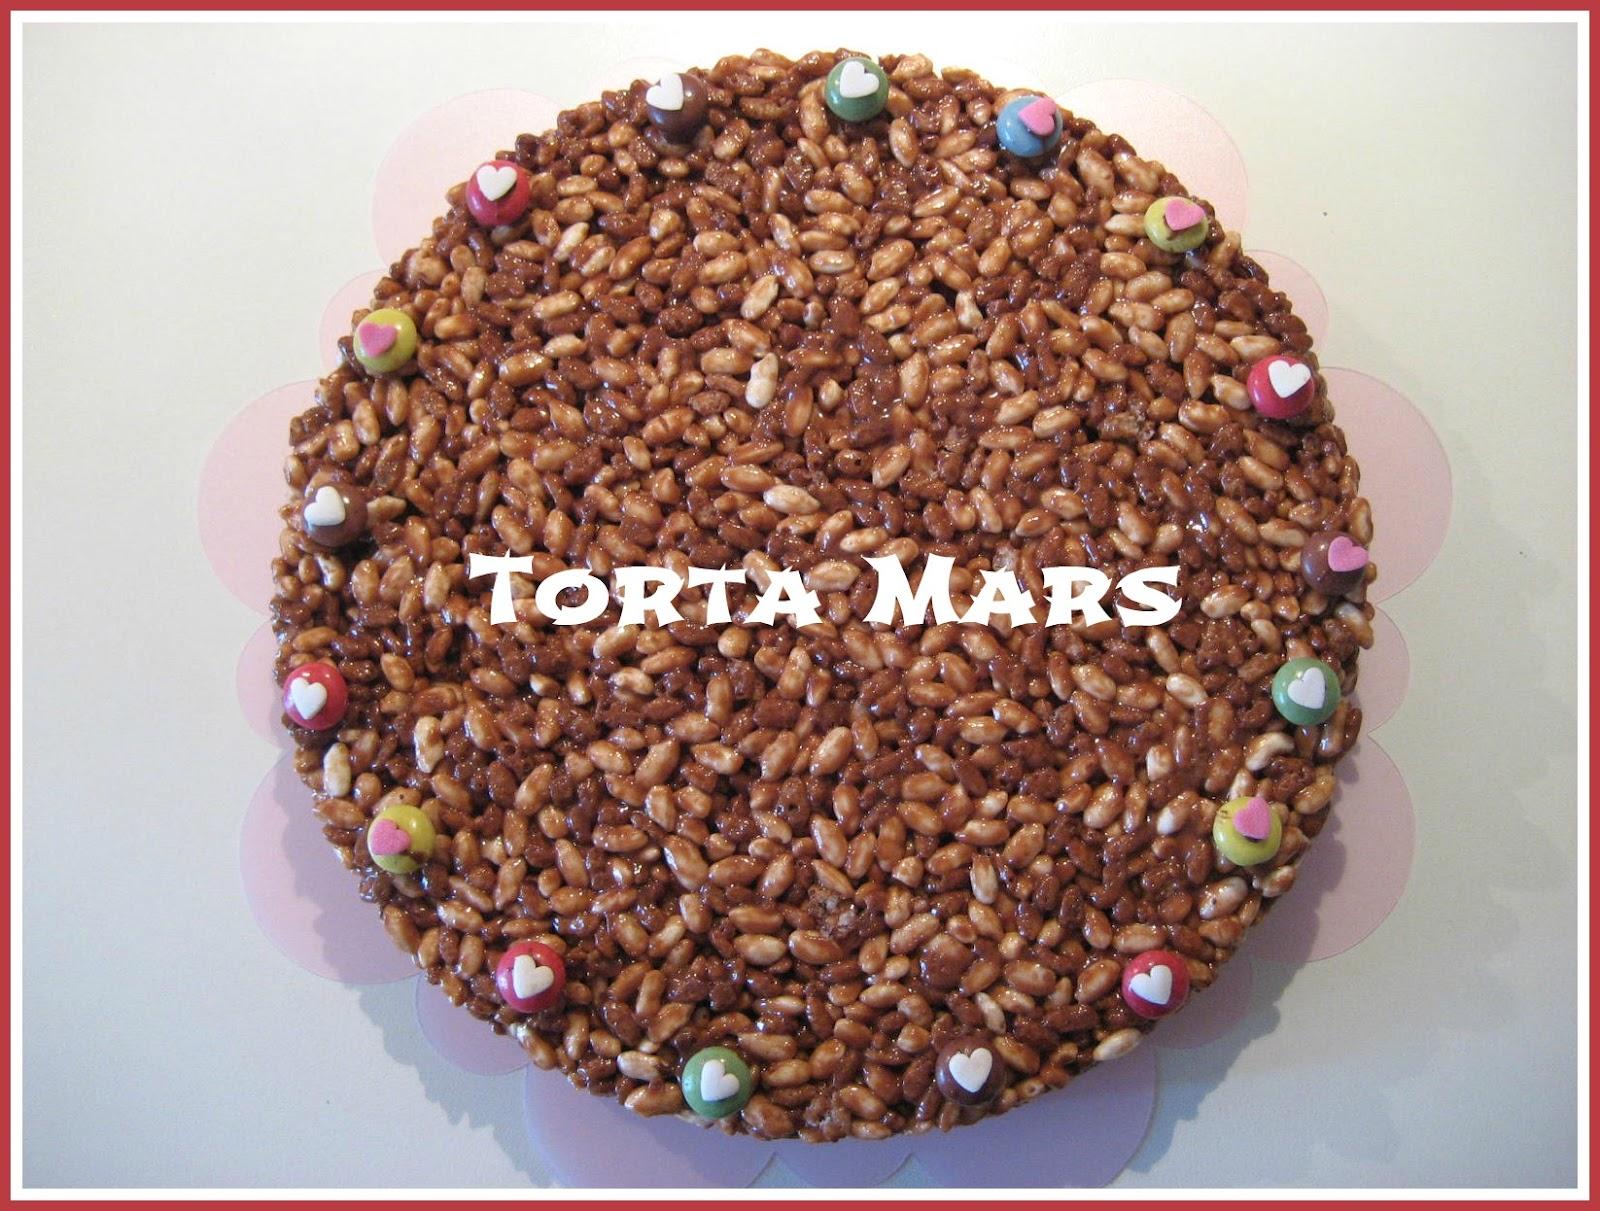 Pasticciando in cucina torta mars for Tortas mars medellin